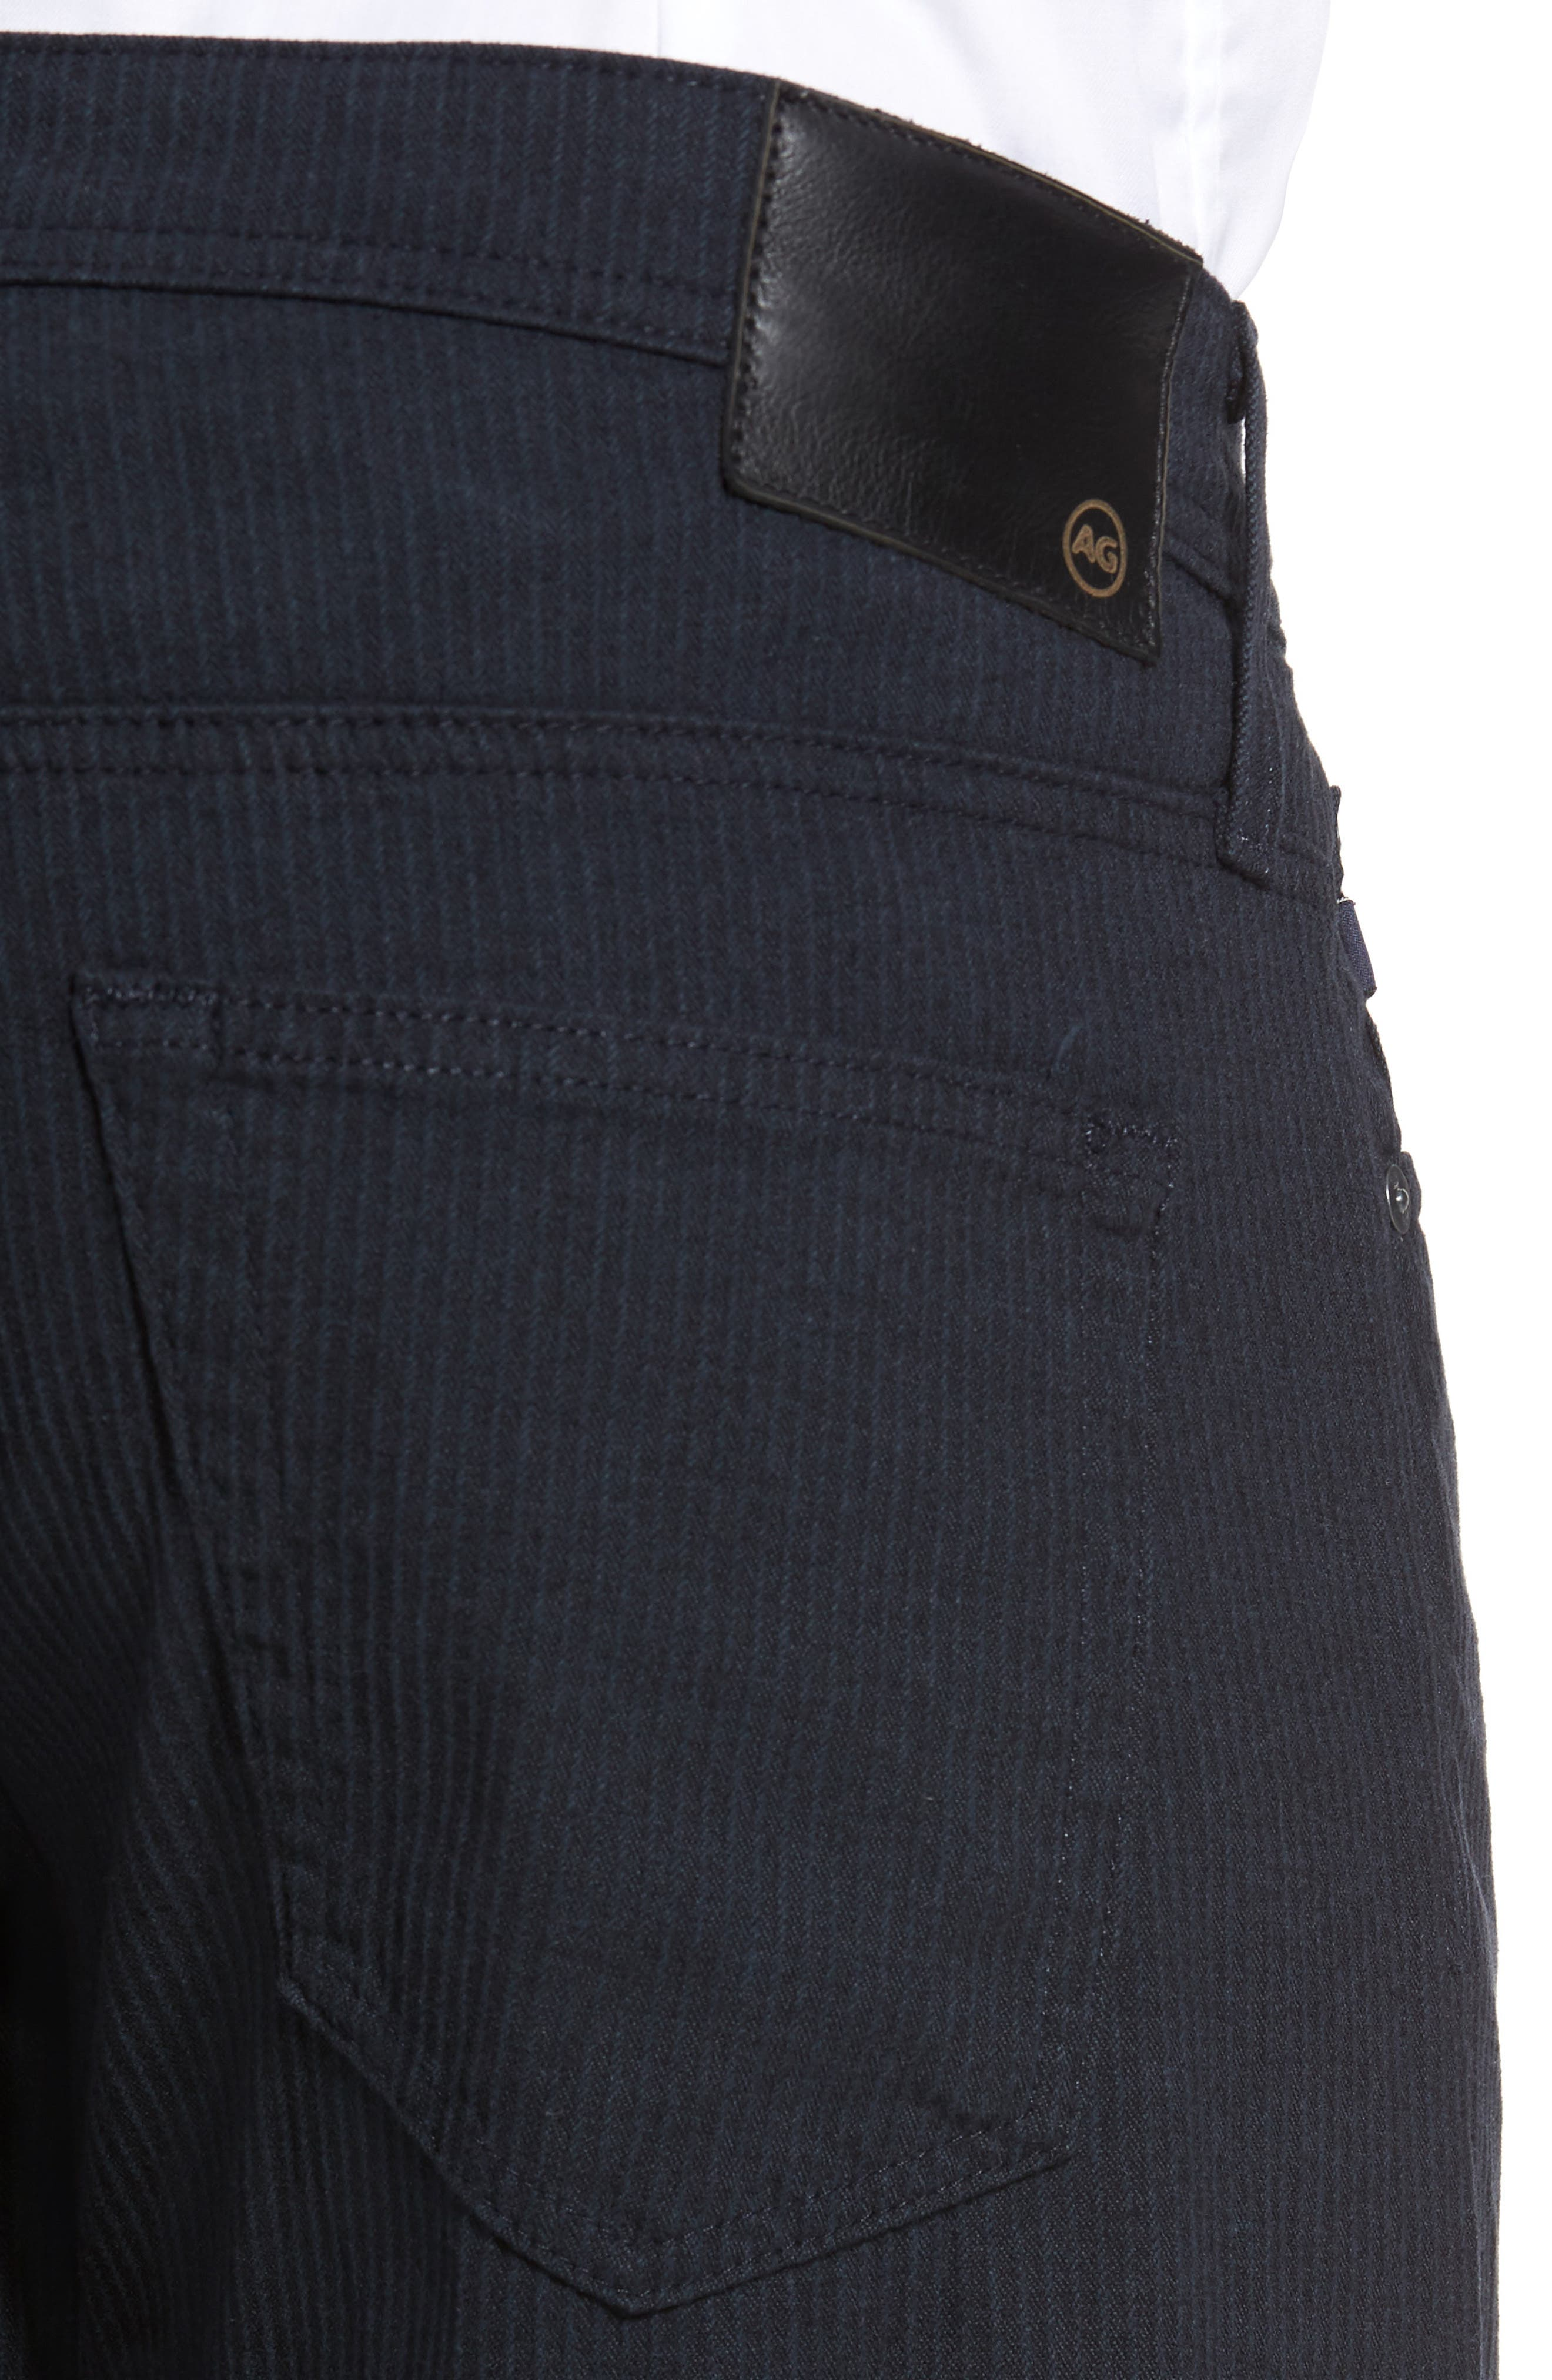 Tellis Modern Slim Stripe Five-Pocket Pants,                             Alternate thumbnail 4, color,                             Midnight Shadow